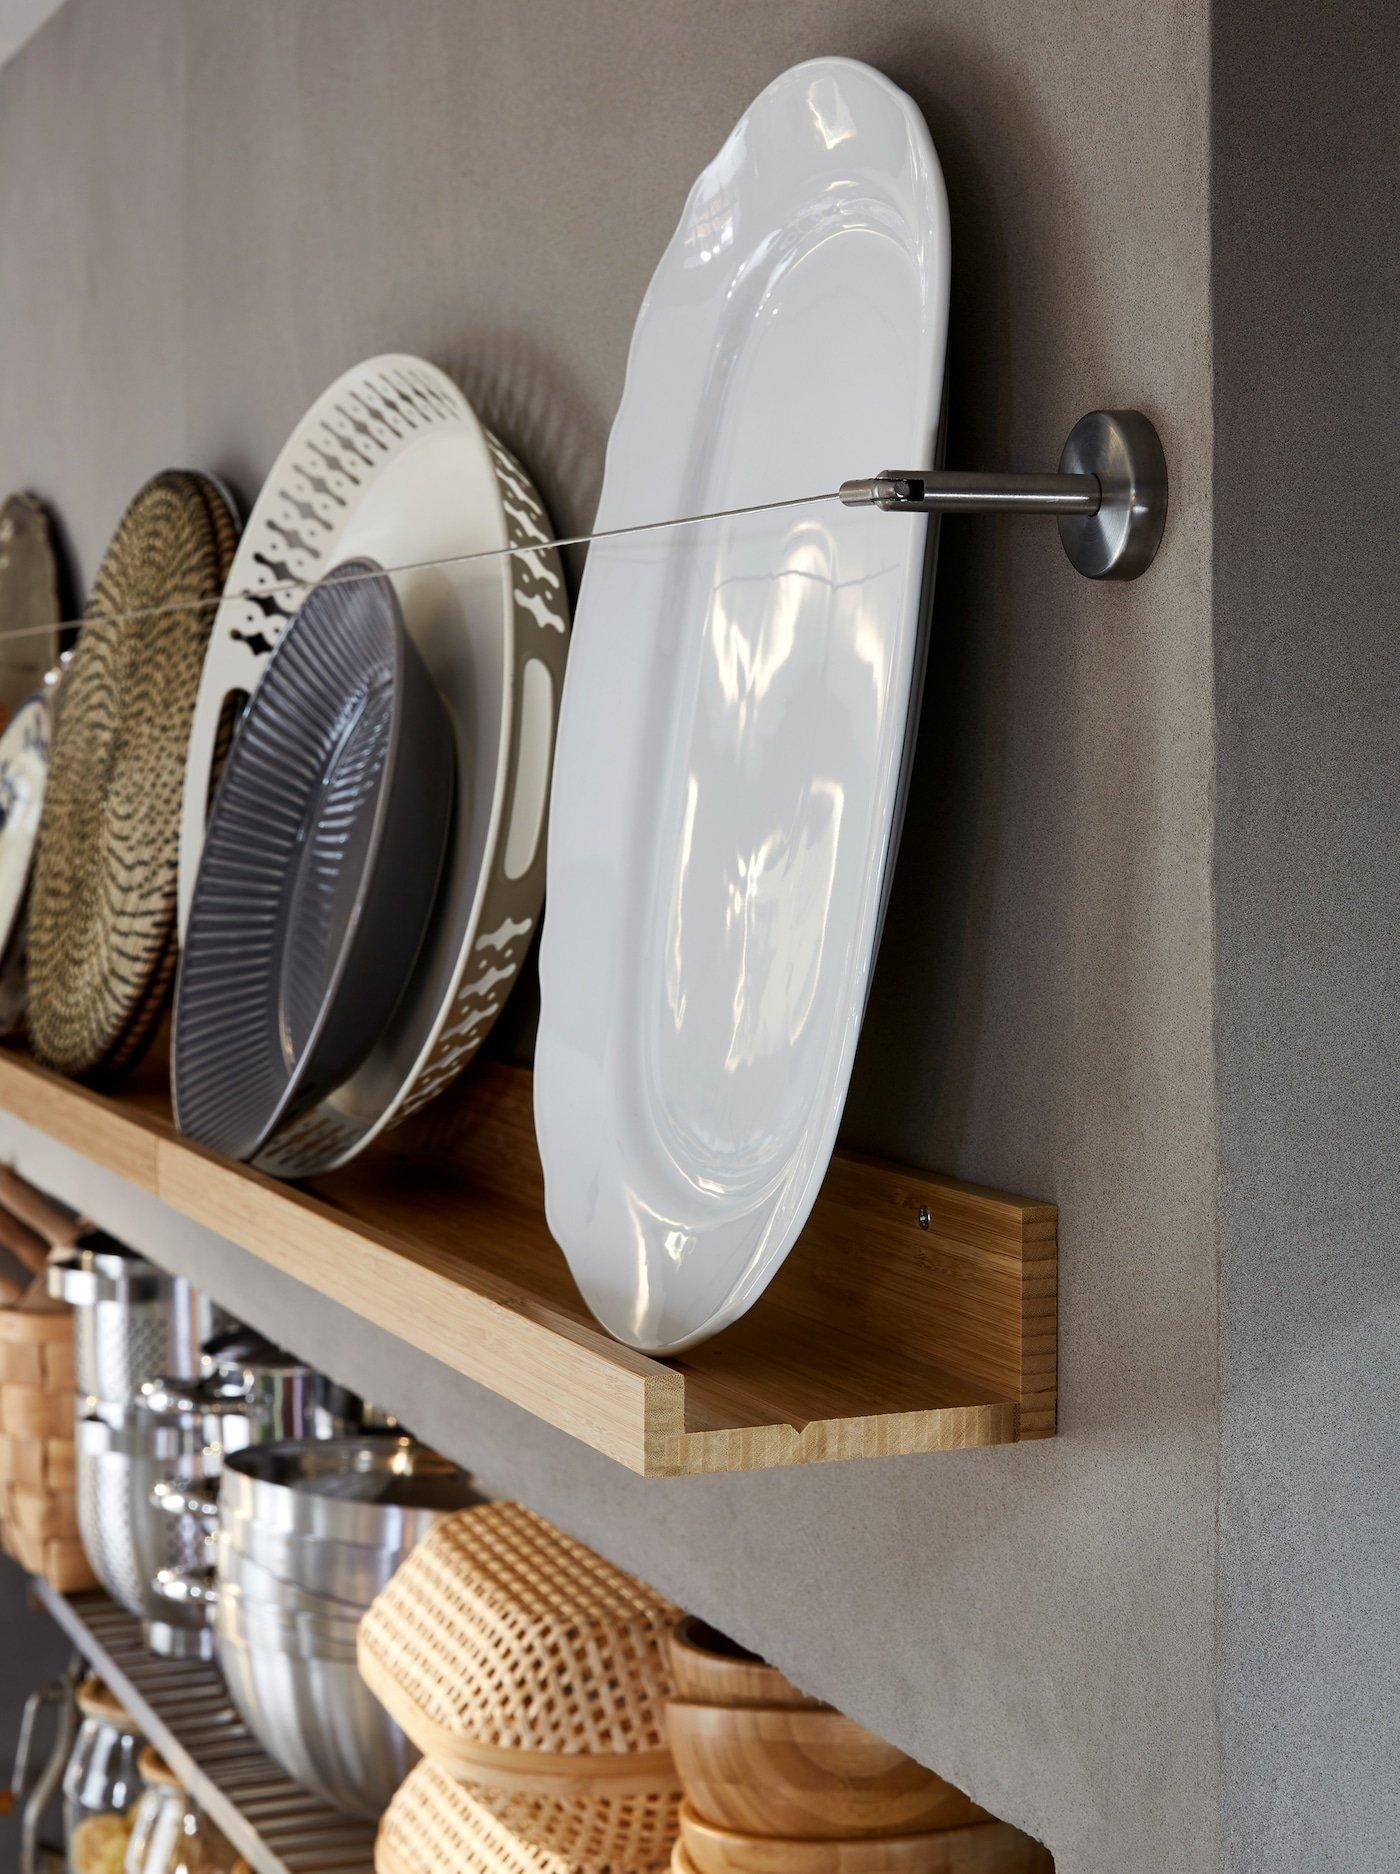 scandinavian-interior-decor-tips-ikea-picture-ledge-storage